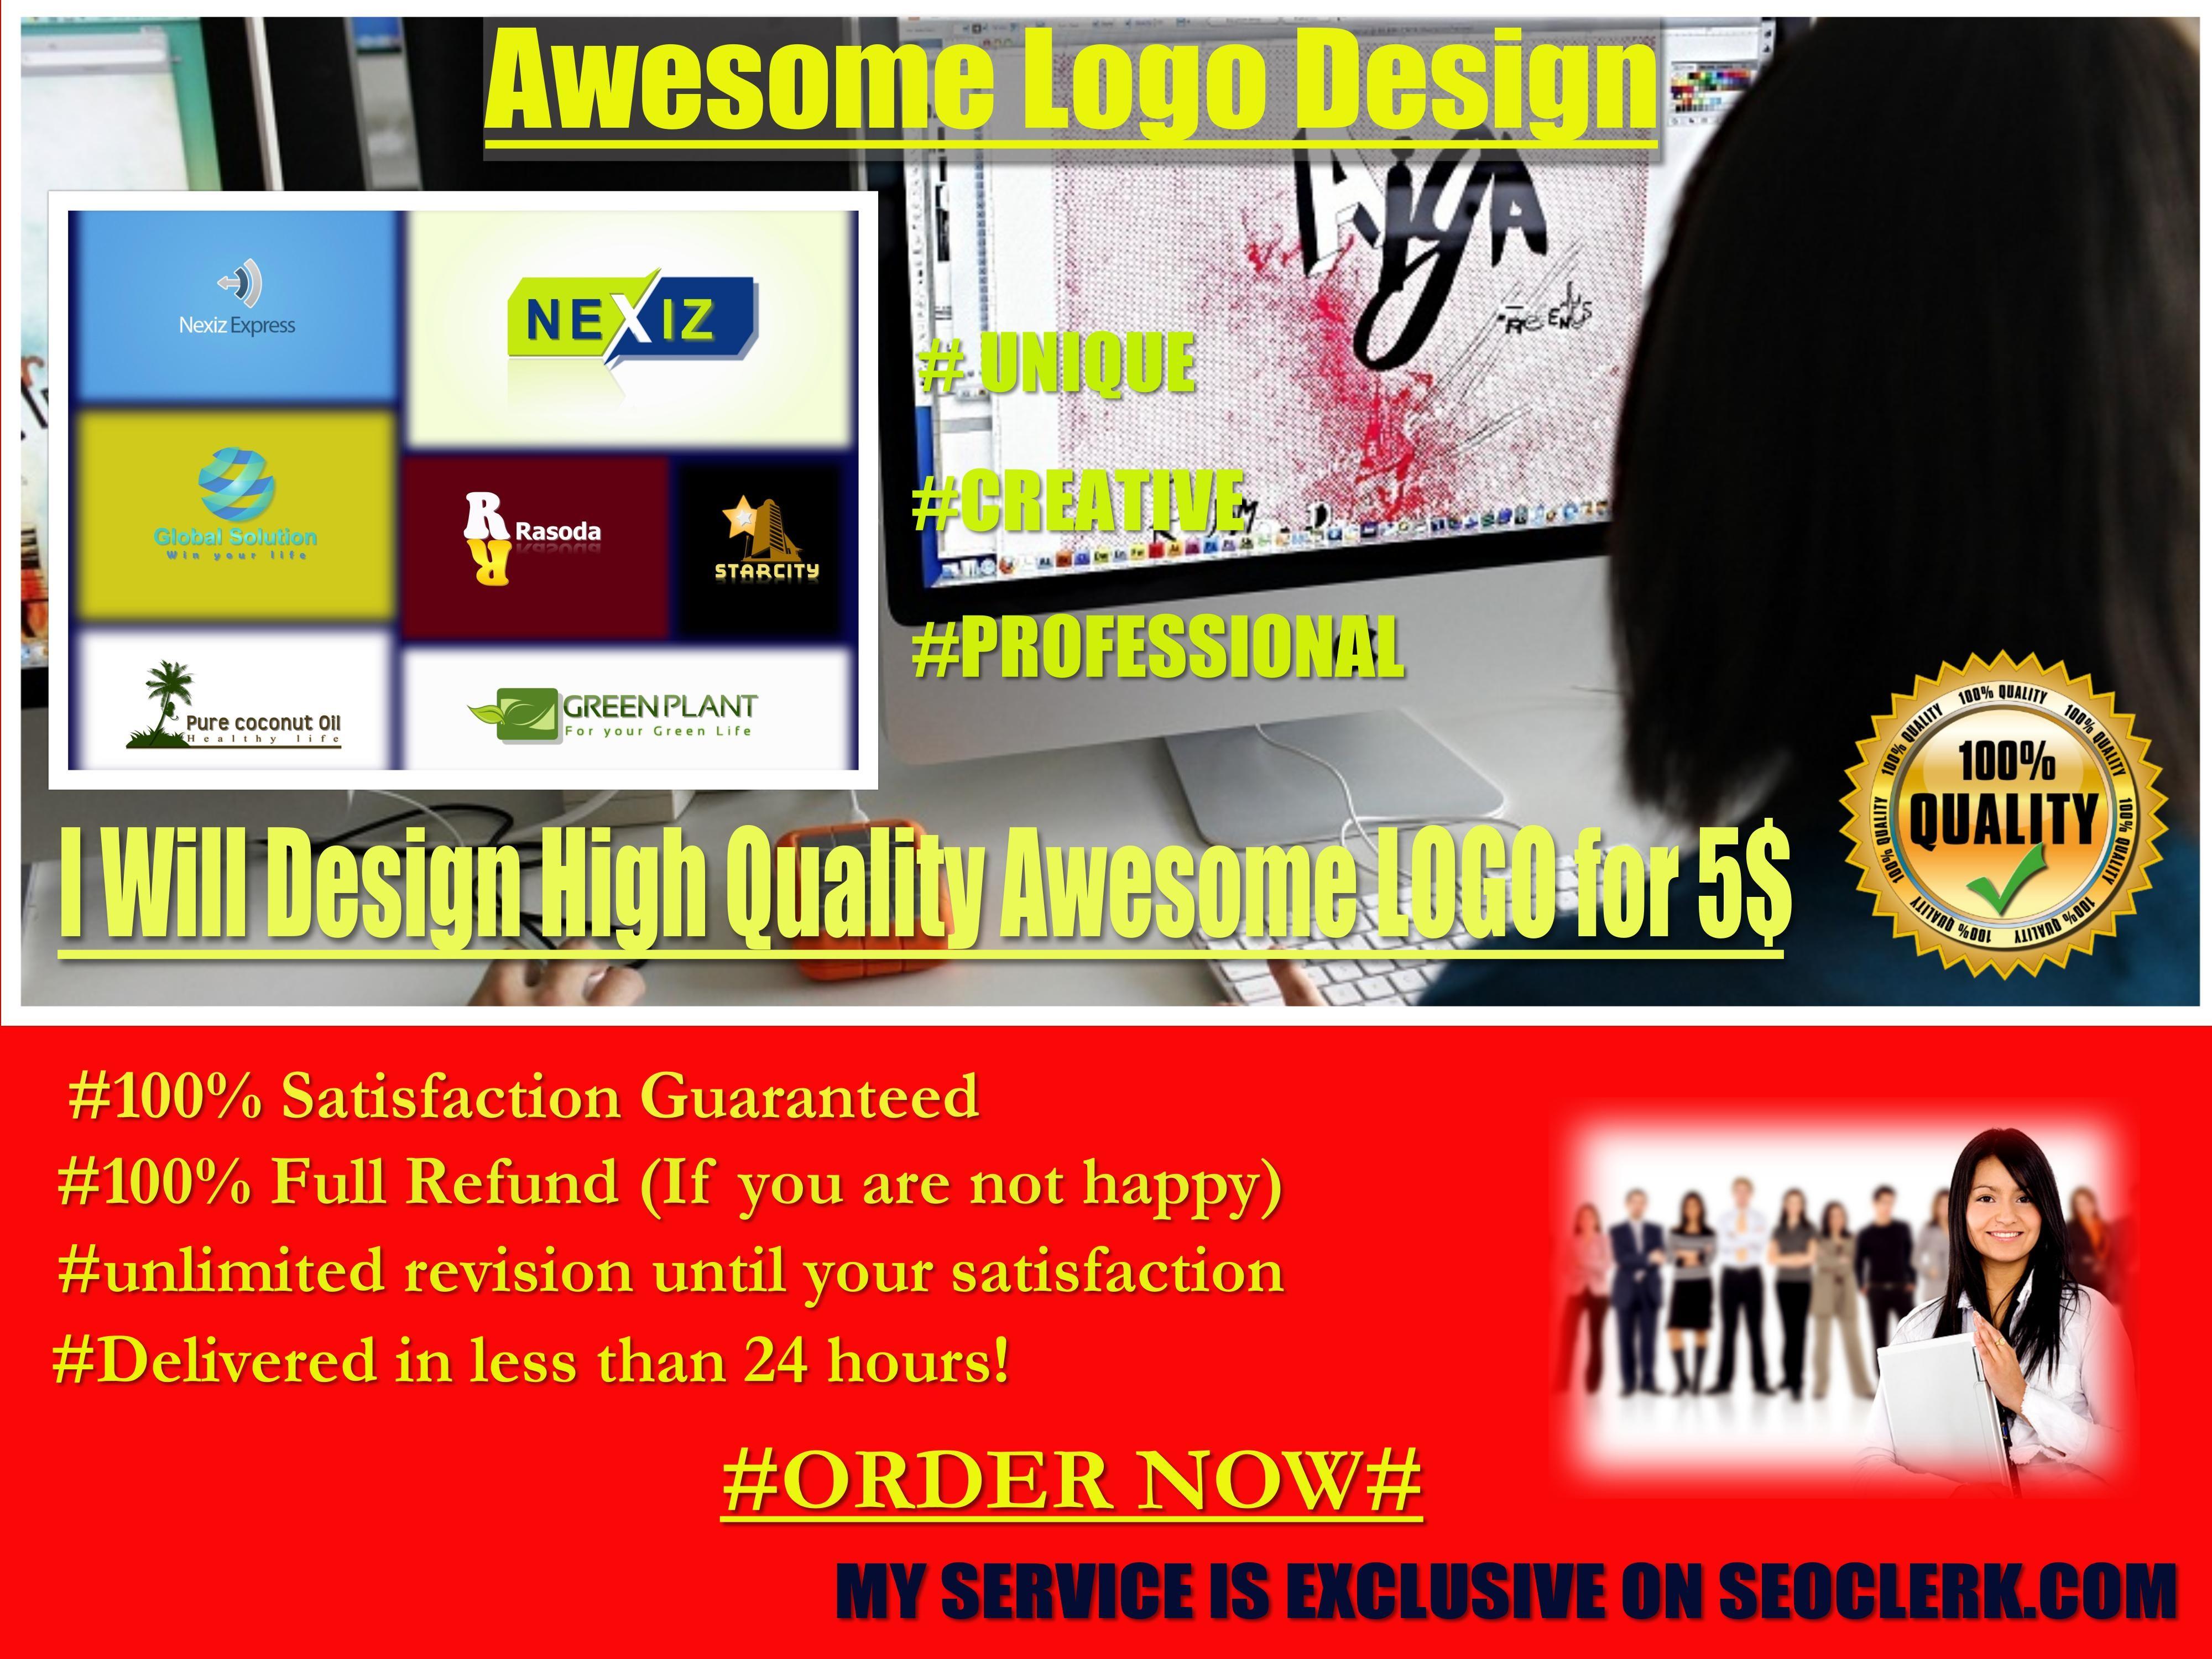 Design 3 CREATIVE EYE CATCHING logo